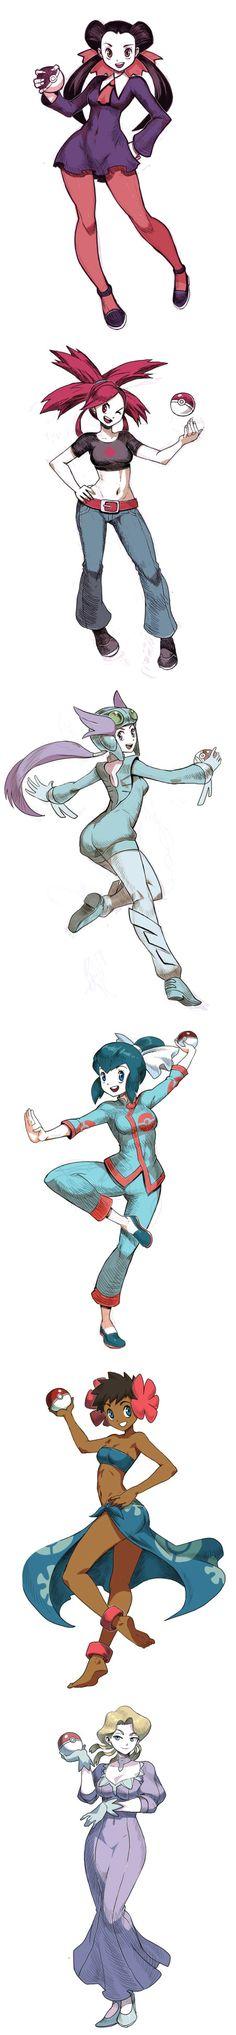 Pokemon Gym Leaders for ORAS... Pokemon girls